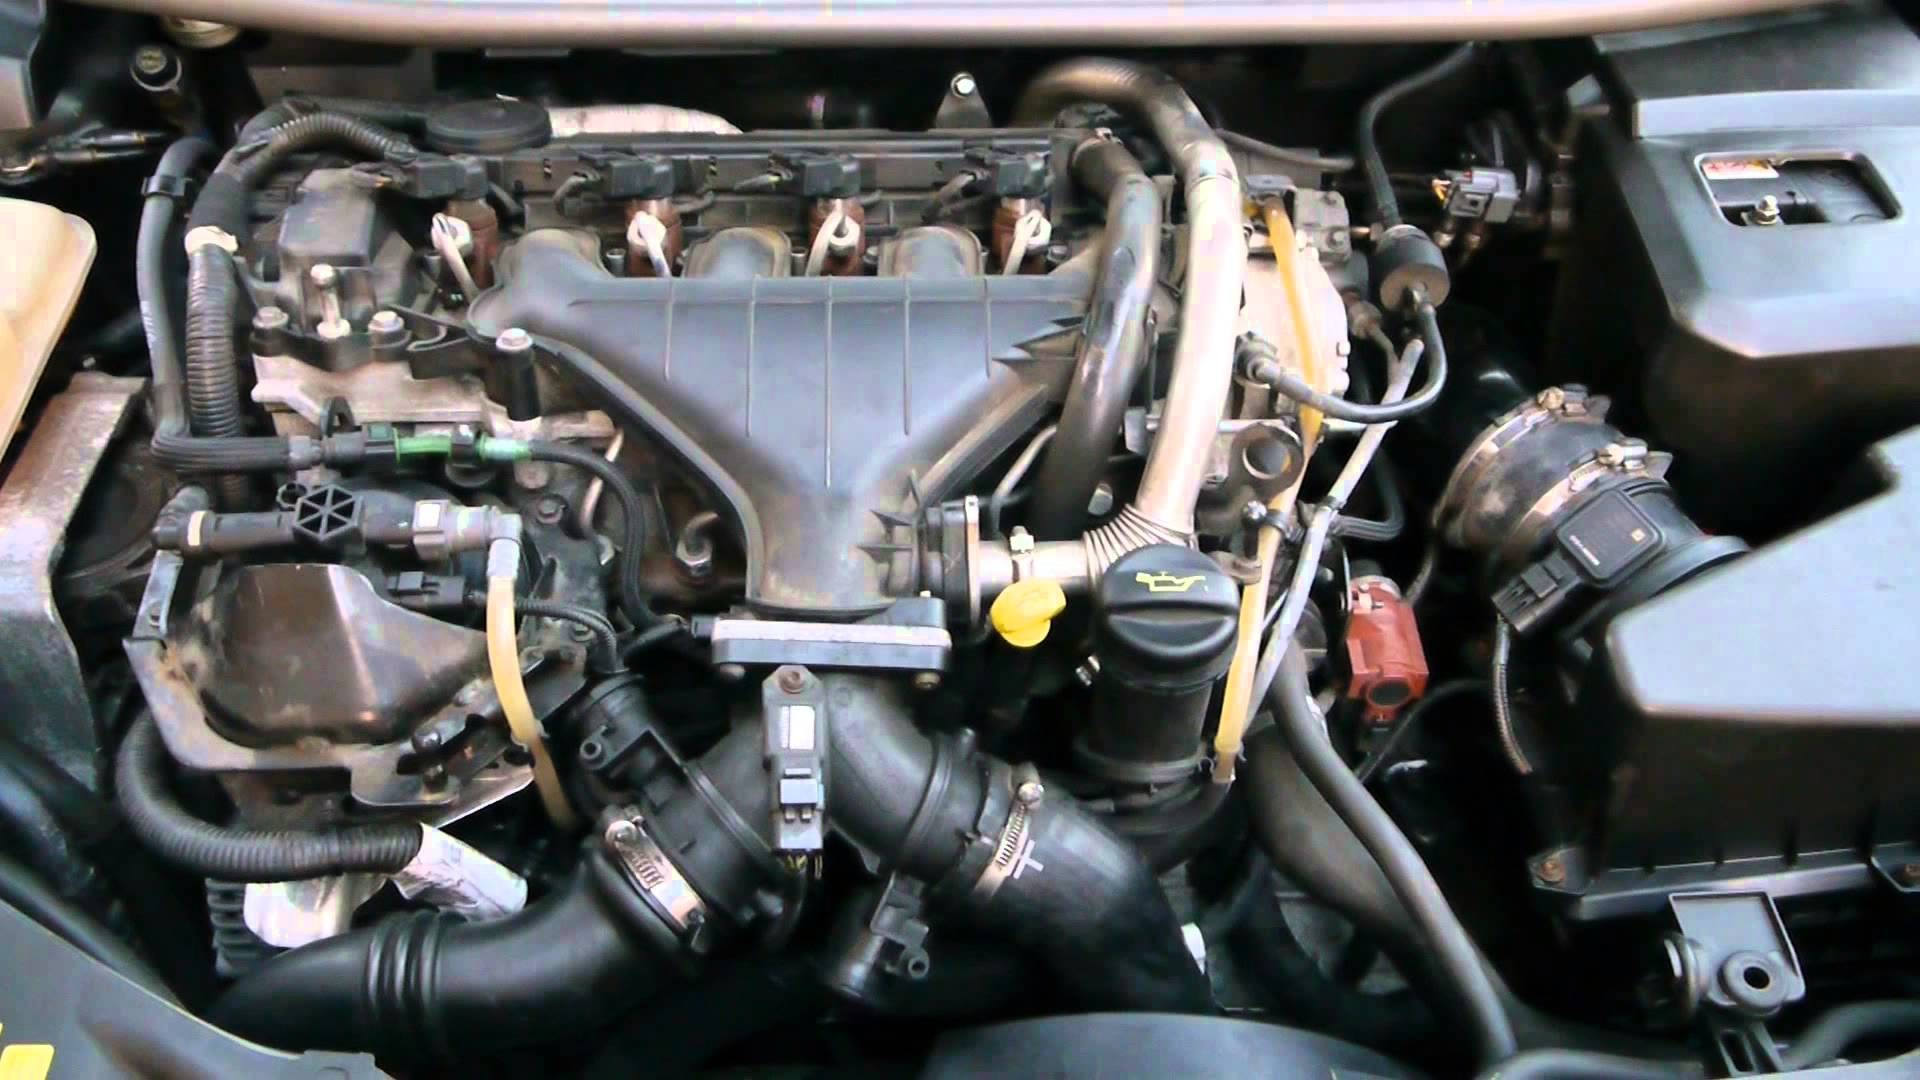 Volvo V40 Engine Diagram Problems with Volvo V50 Engine False Start but Runs Ok 14 11 2012 Of Volvo V40 Engine Diagram